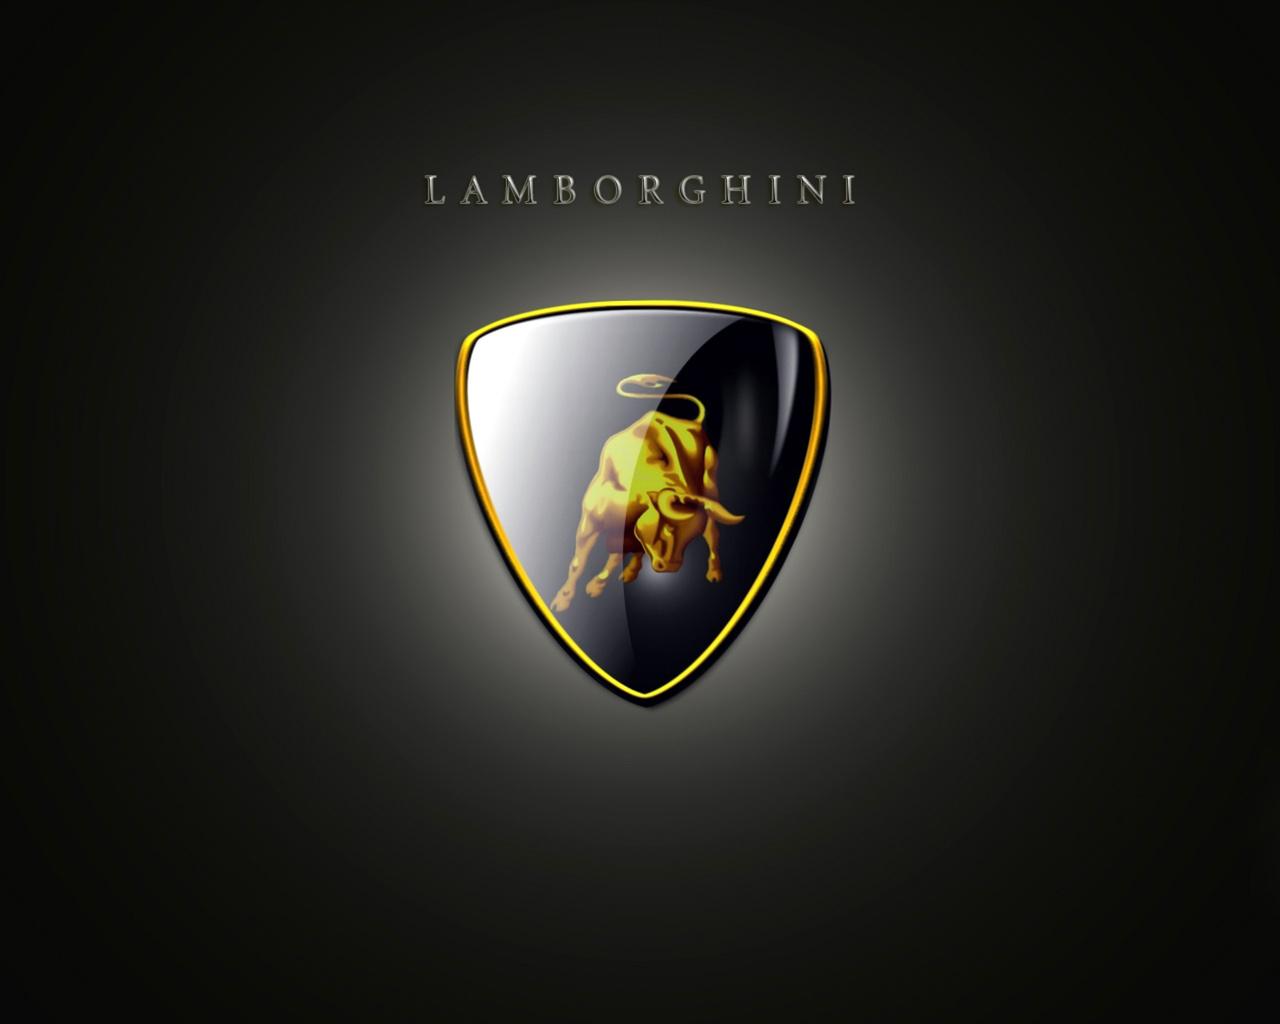 http://2.bp.blogspot.com/-SlcLvlUFi9A/TjPPbICma-I/AAAAAAAAHwM/-4Sqi8FMDWE/s1600/Ferrari%20Cars%20Logo%20%2822%29.jpg